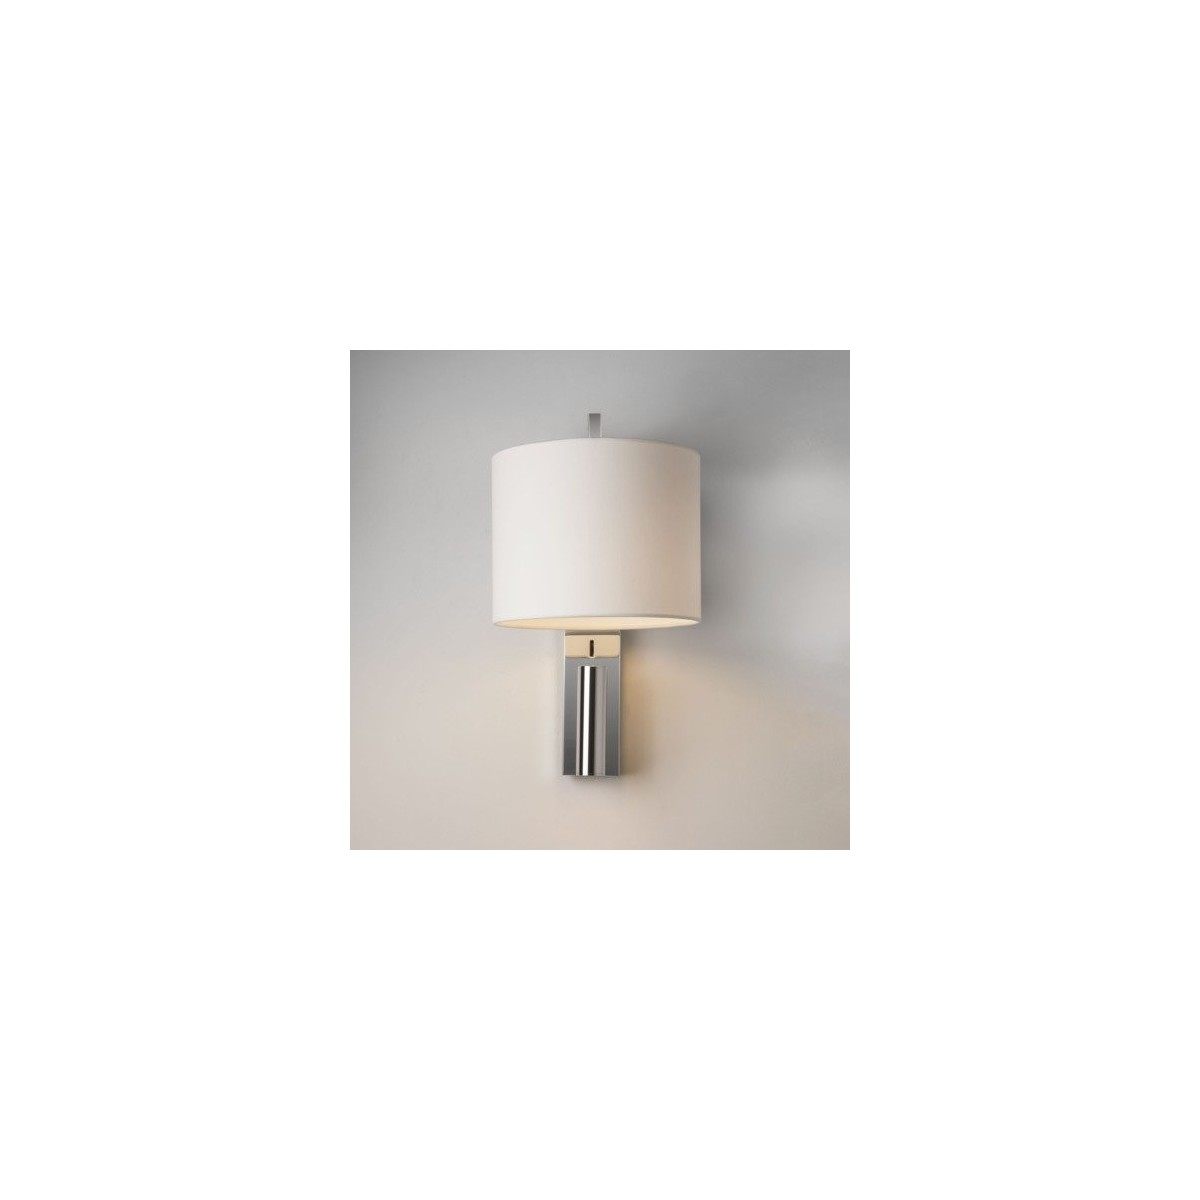 Astro Ravello LED Reader Do Czytania 1x40W Max E27 Chrom Polerowany 1222018